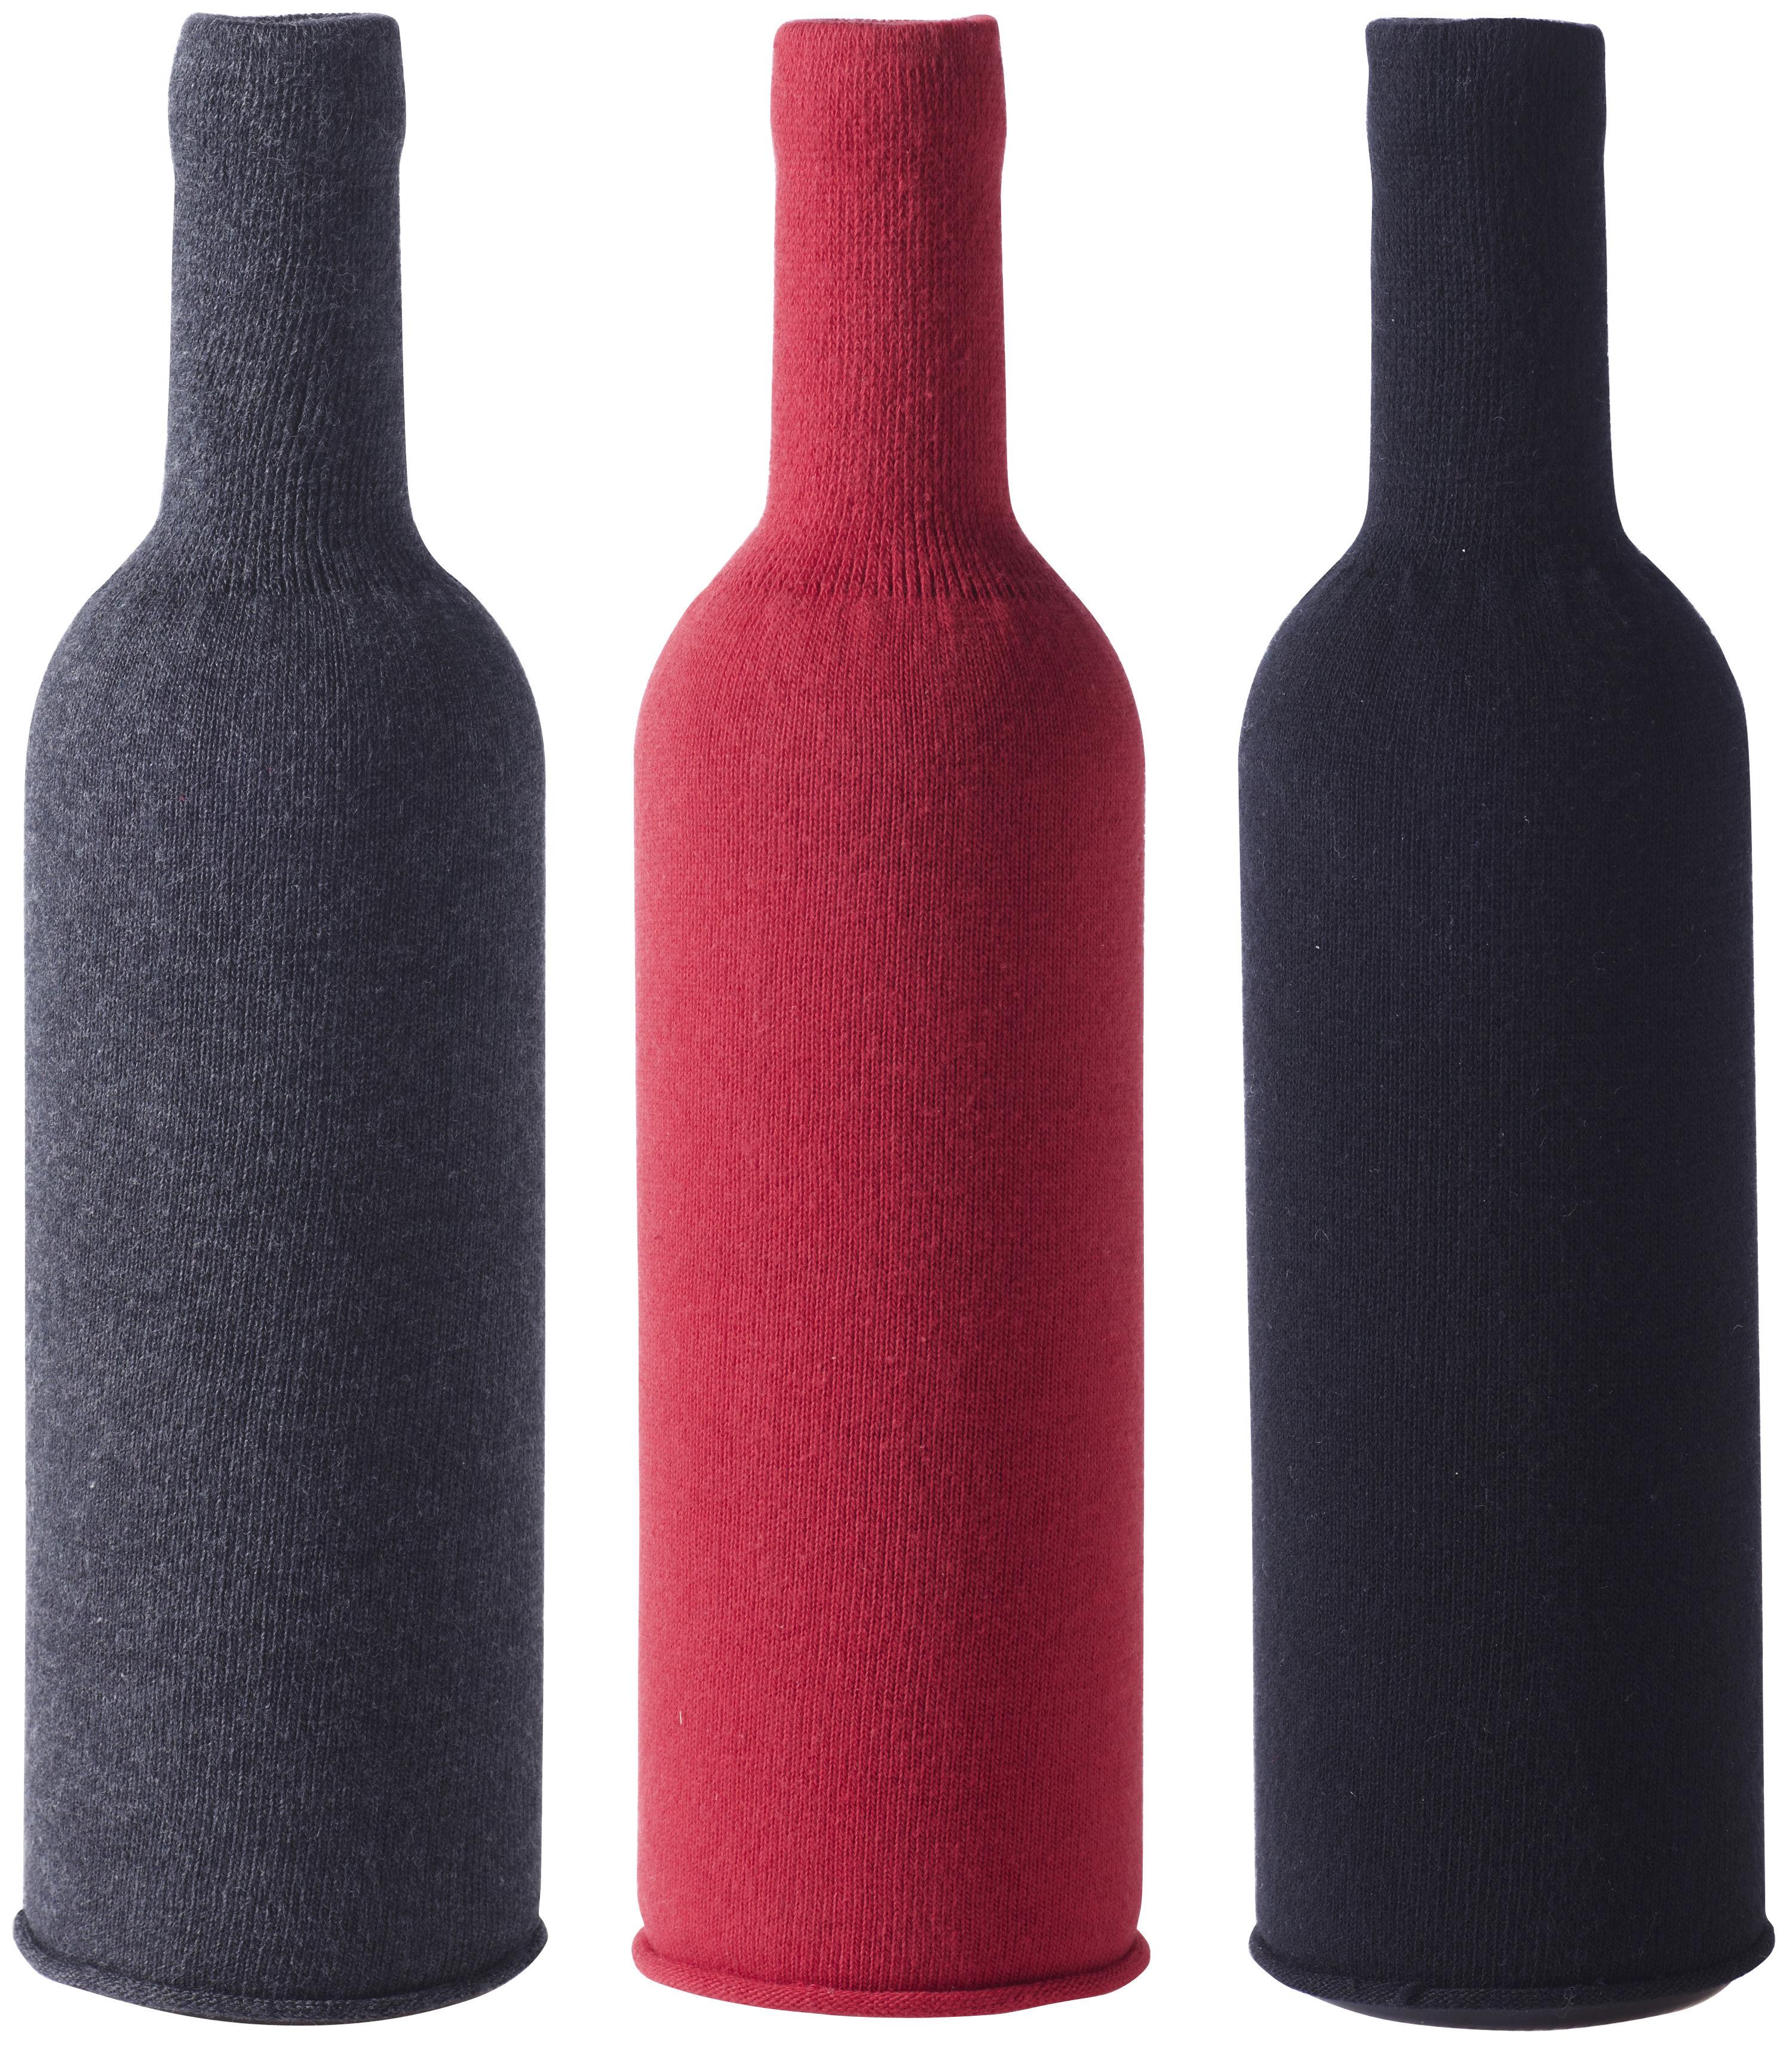 Tableware - Kitchen Accessories - Bottle cover by L'Atelier du Vin - Black / Anthracite grey / Red - Cotton, Elasthanne, Polyamide